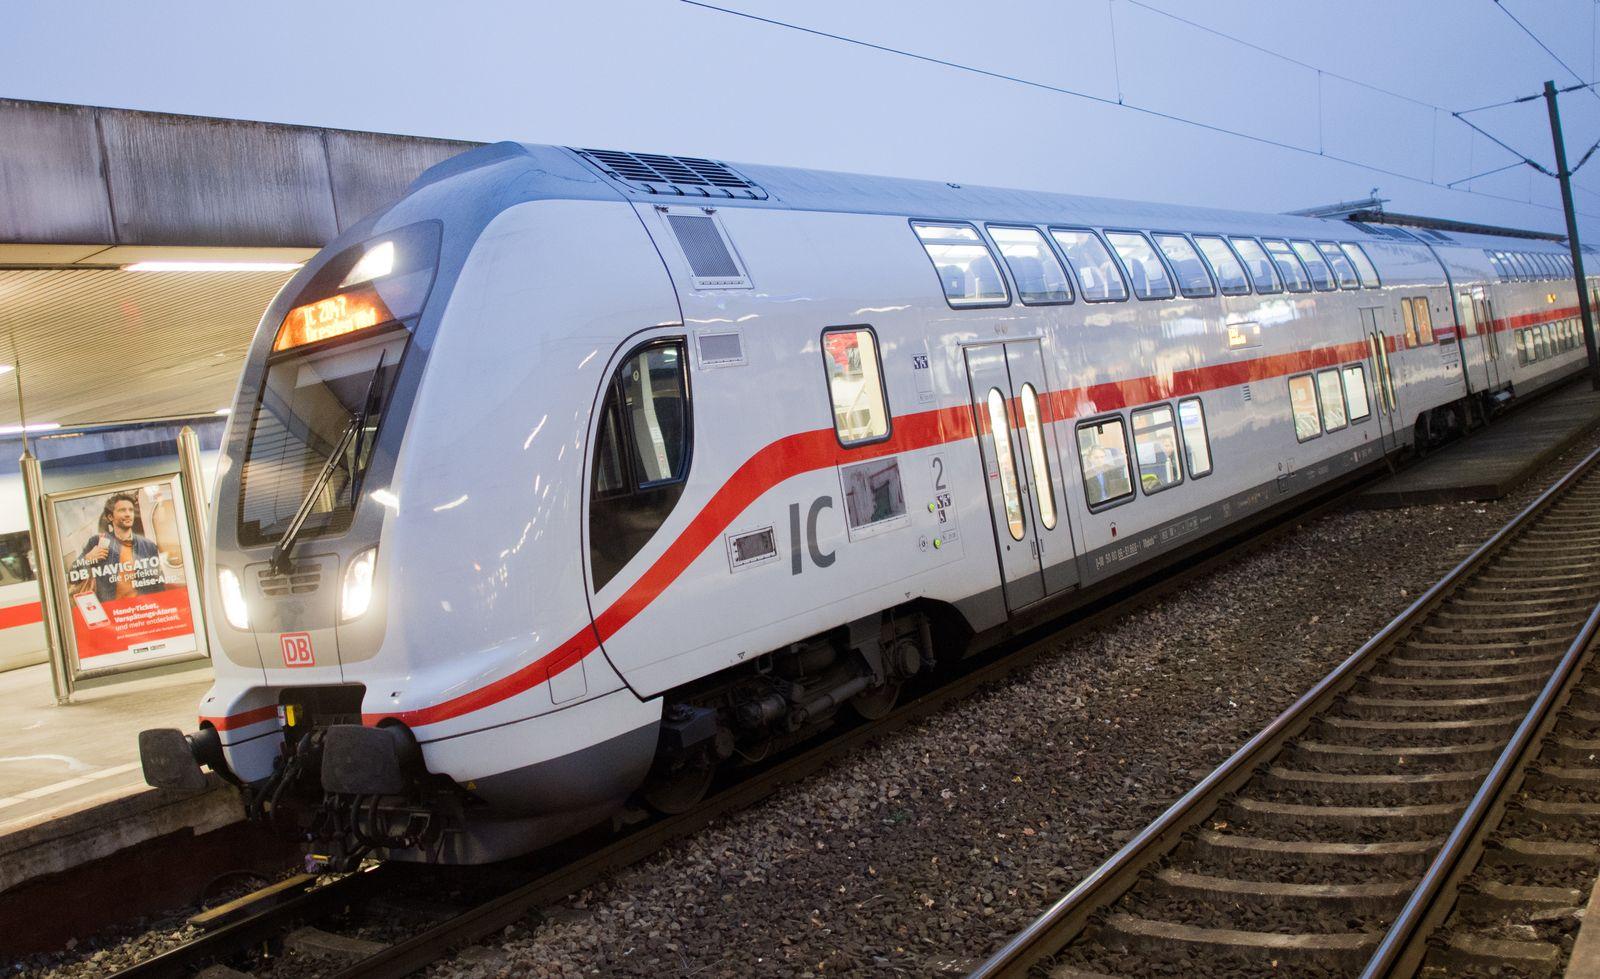 IC 2 / Deutsche Bahn